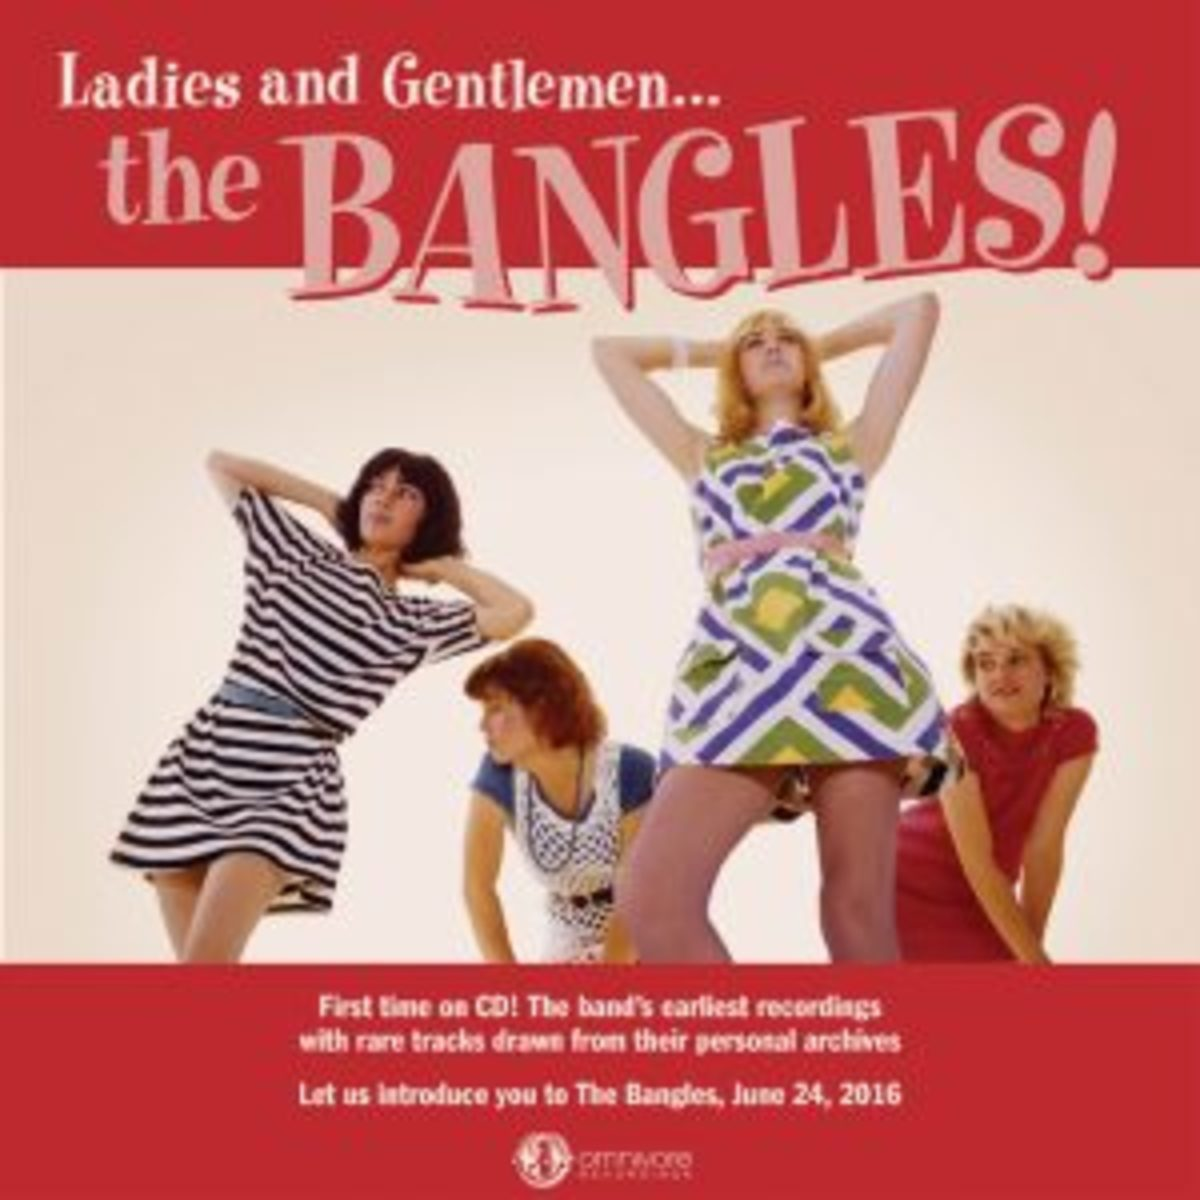 bangles-cd-lad-gent-web